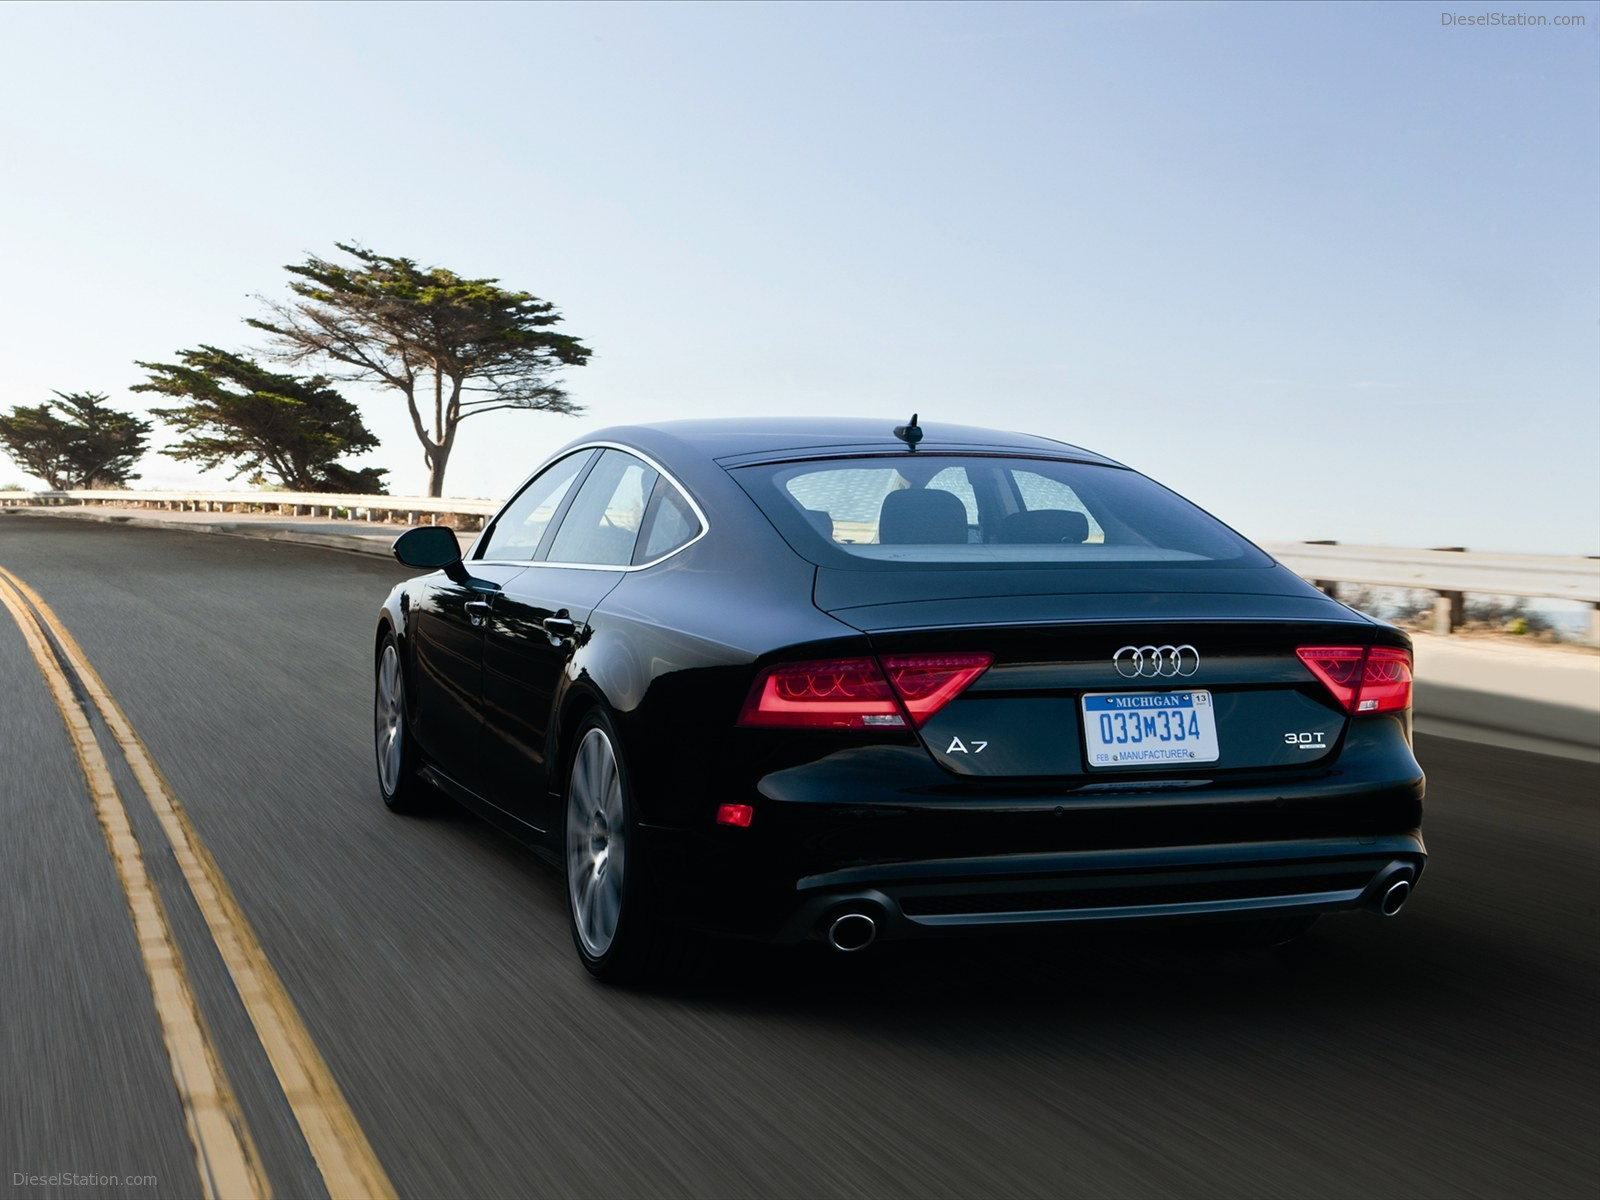 Audi A7 Wallpapers Wide Screen Wallpaper 1080p 2k 4k